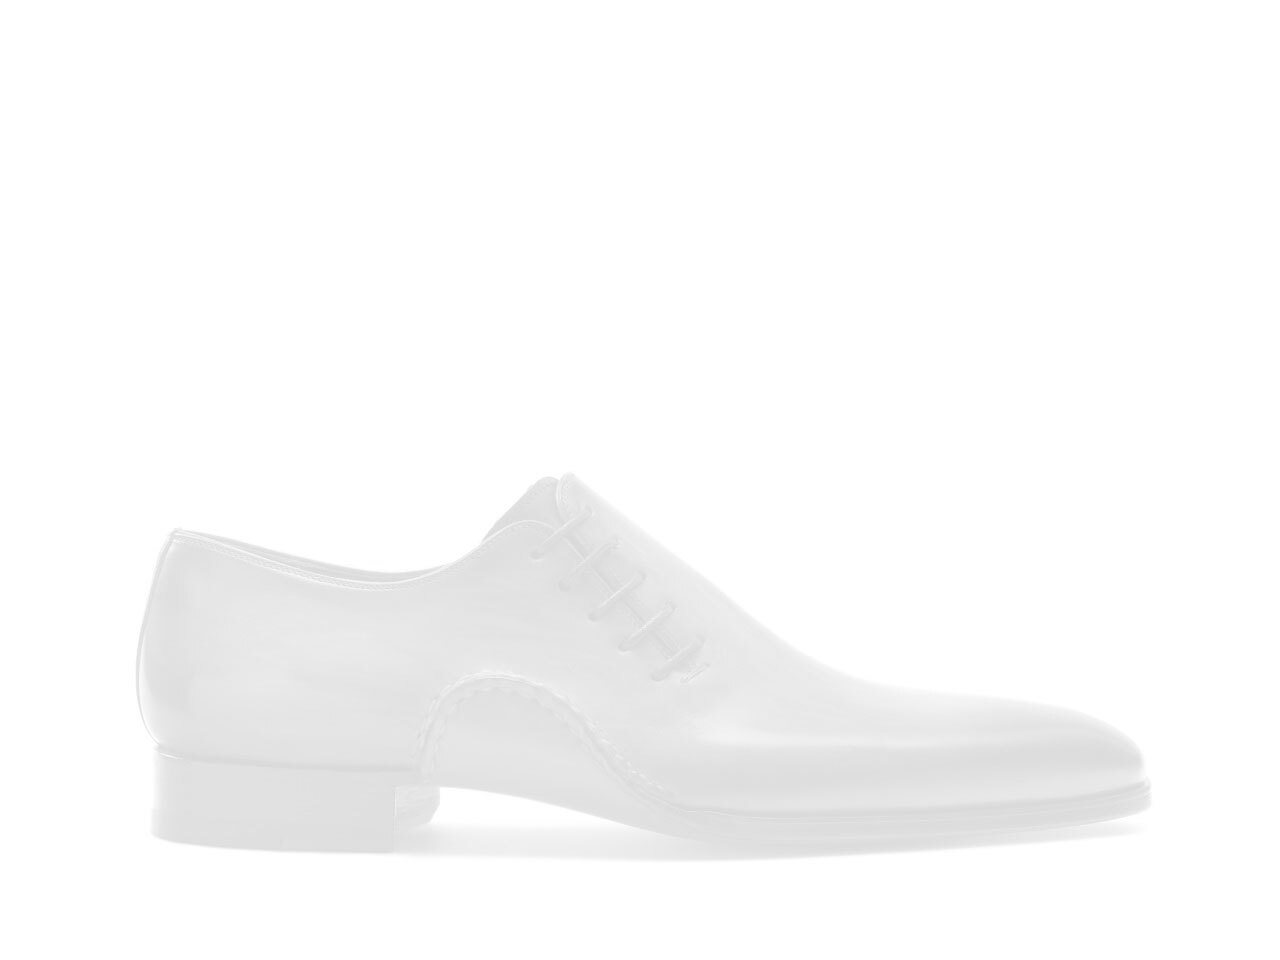 Sole of the Magnanni Ibiza Black Men's Sneakers